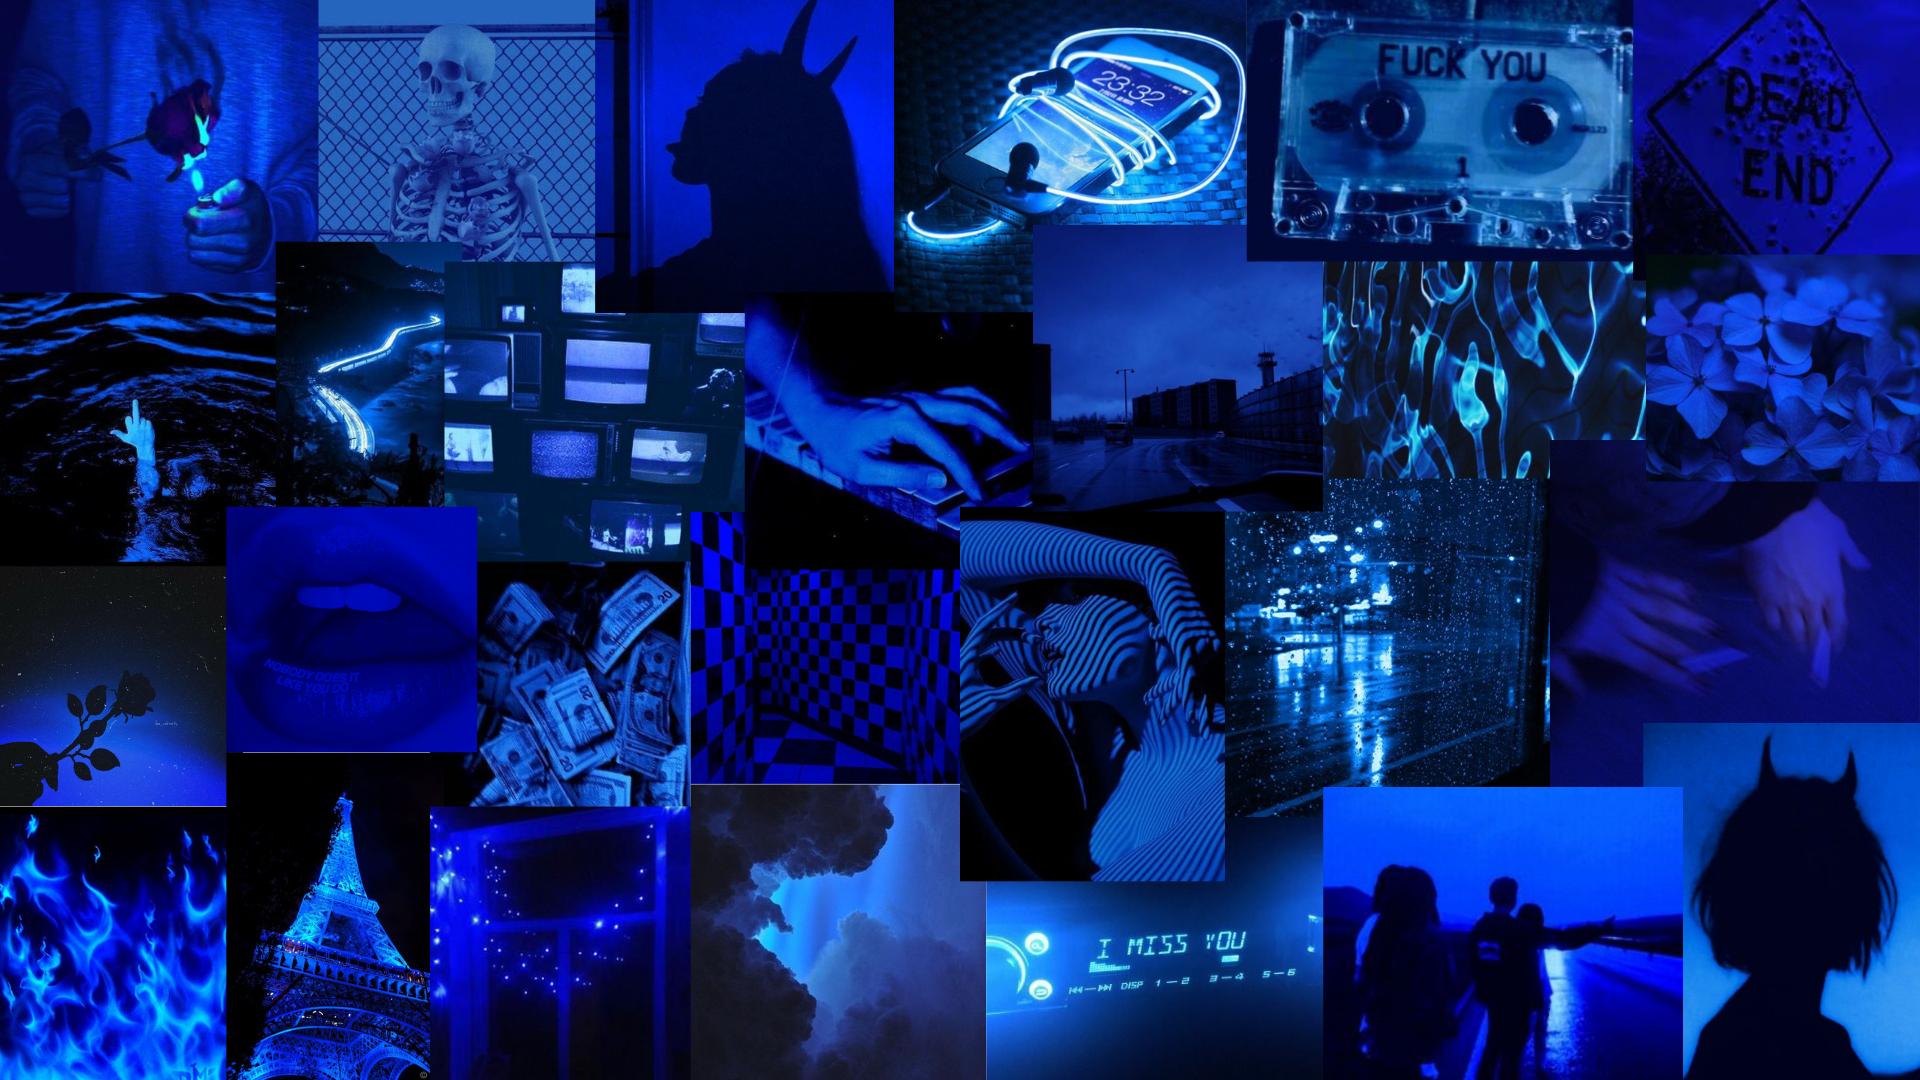 Dark Blue Aesthetic In 2021 Dark Blue Wallpaper Blue Aesthetic Mood Wallpaper